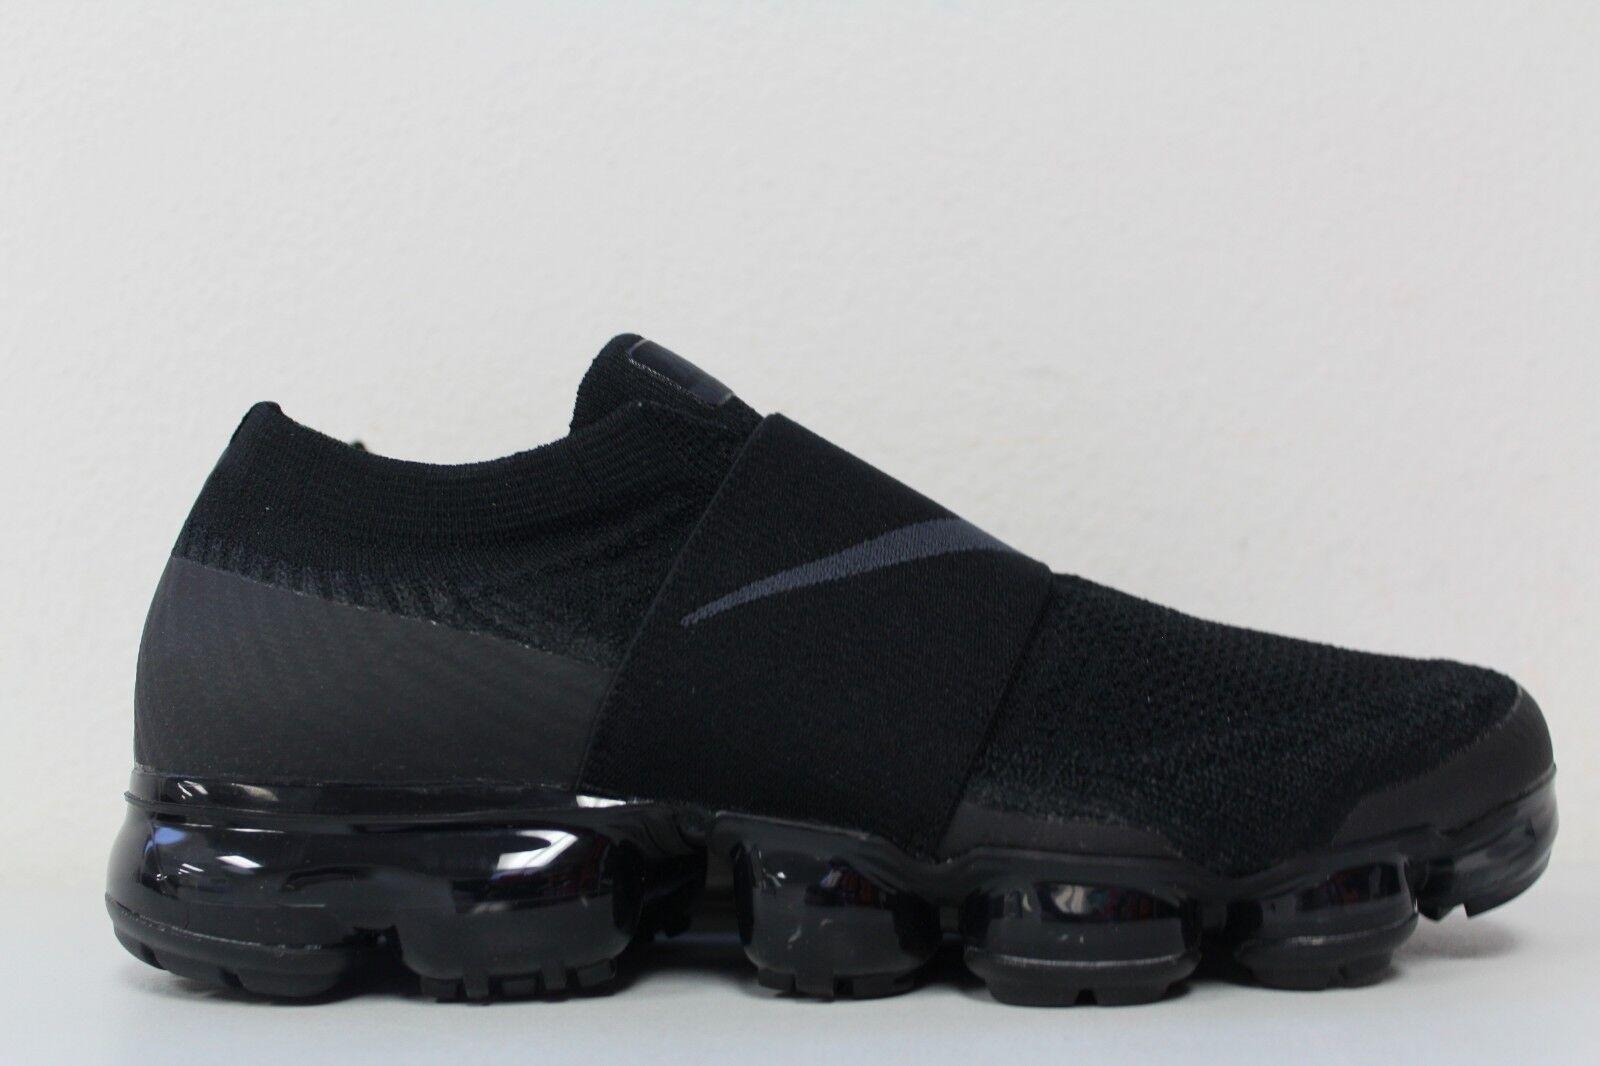 Nike Womens Air Vapormax Flyknit Moc Triple Black AA4155-004 Size 9.5